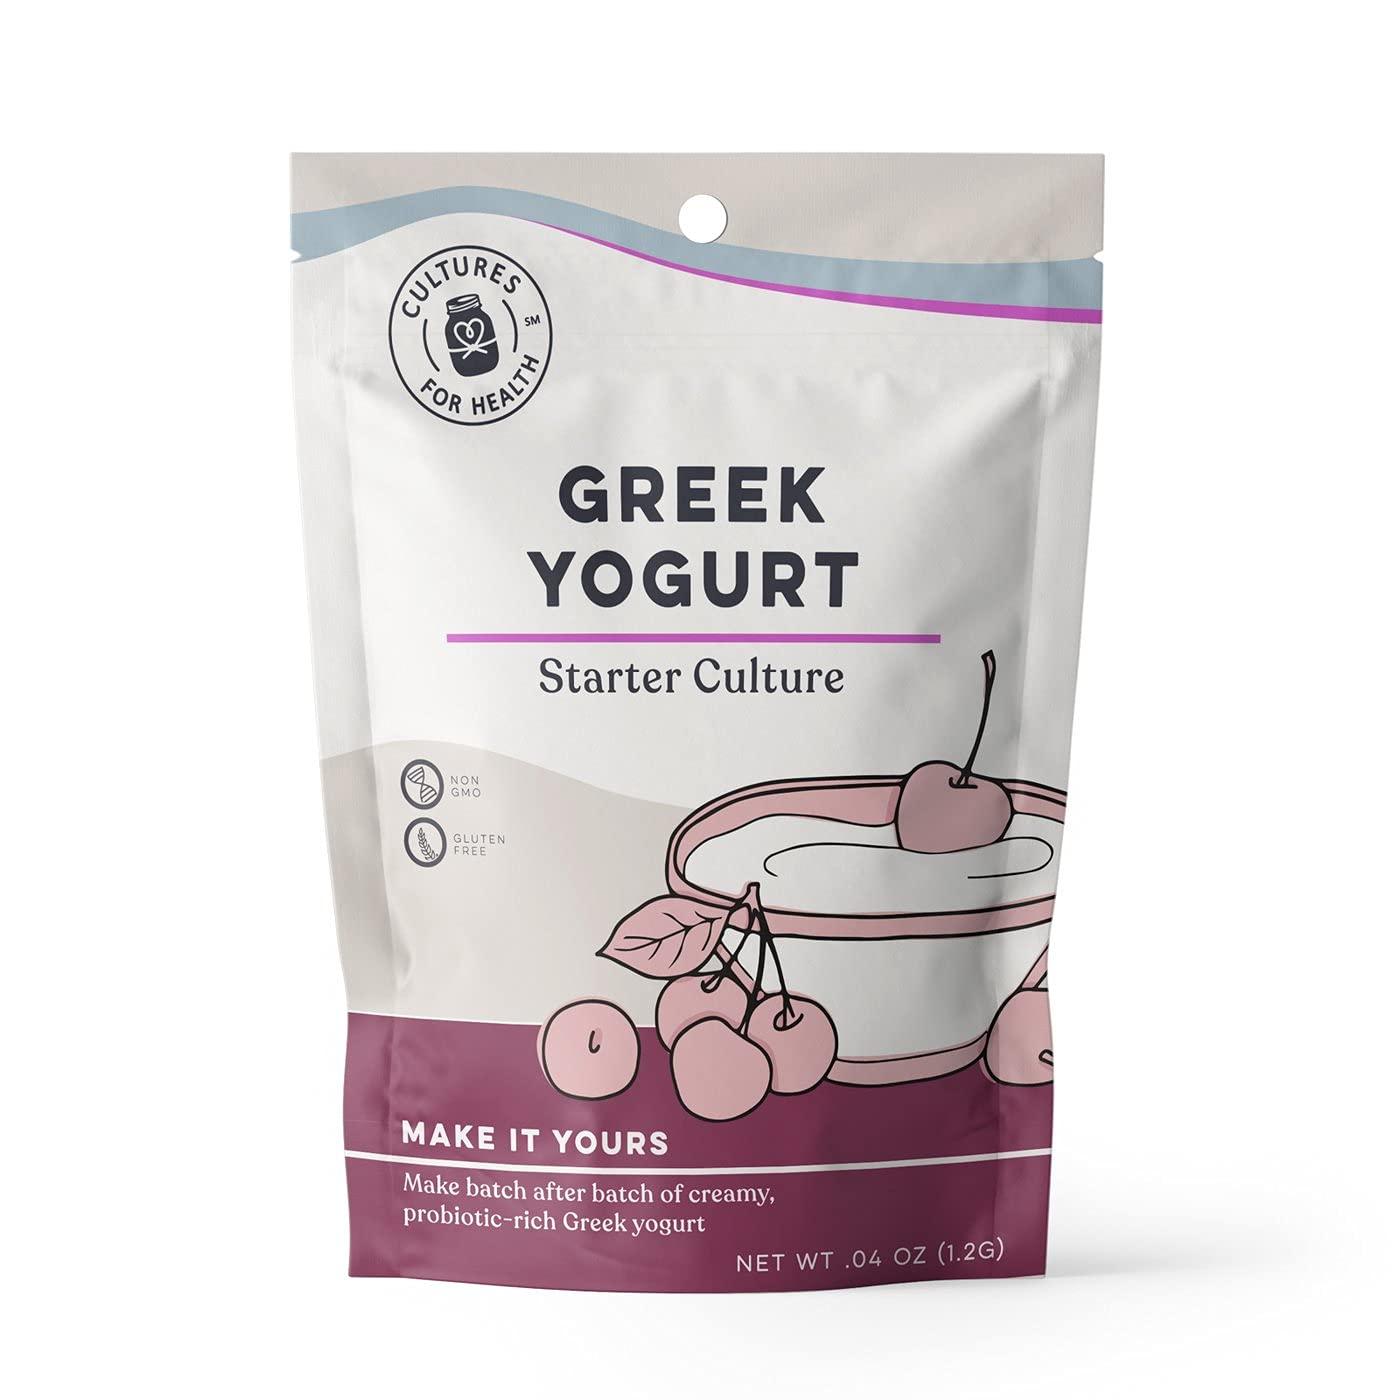 Cultures for Health Greek Yogurt Starter Culture